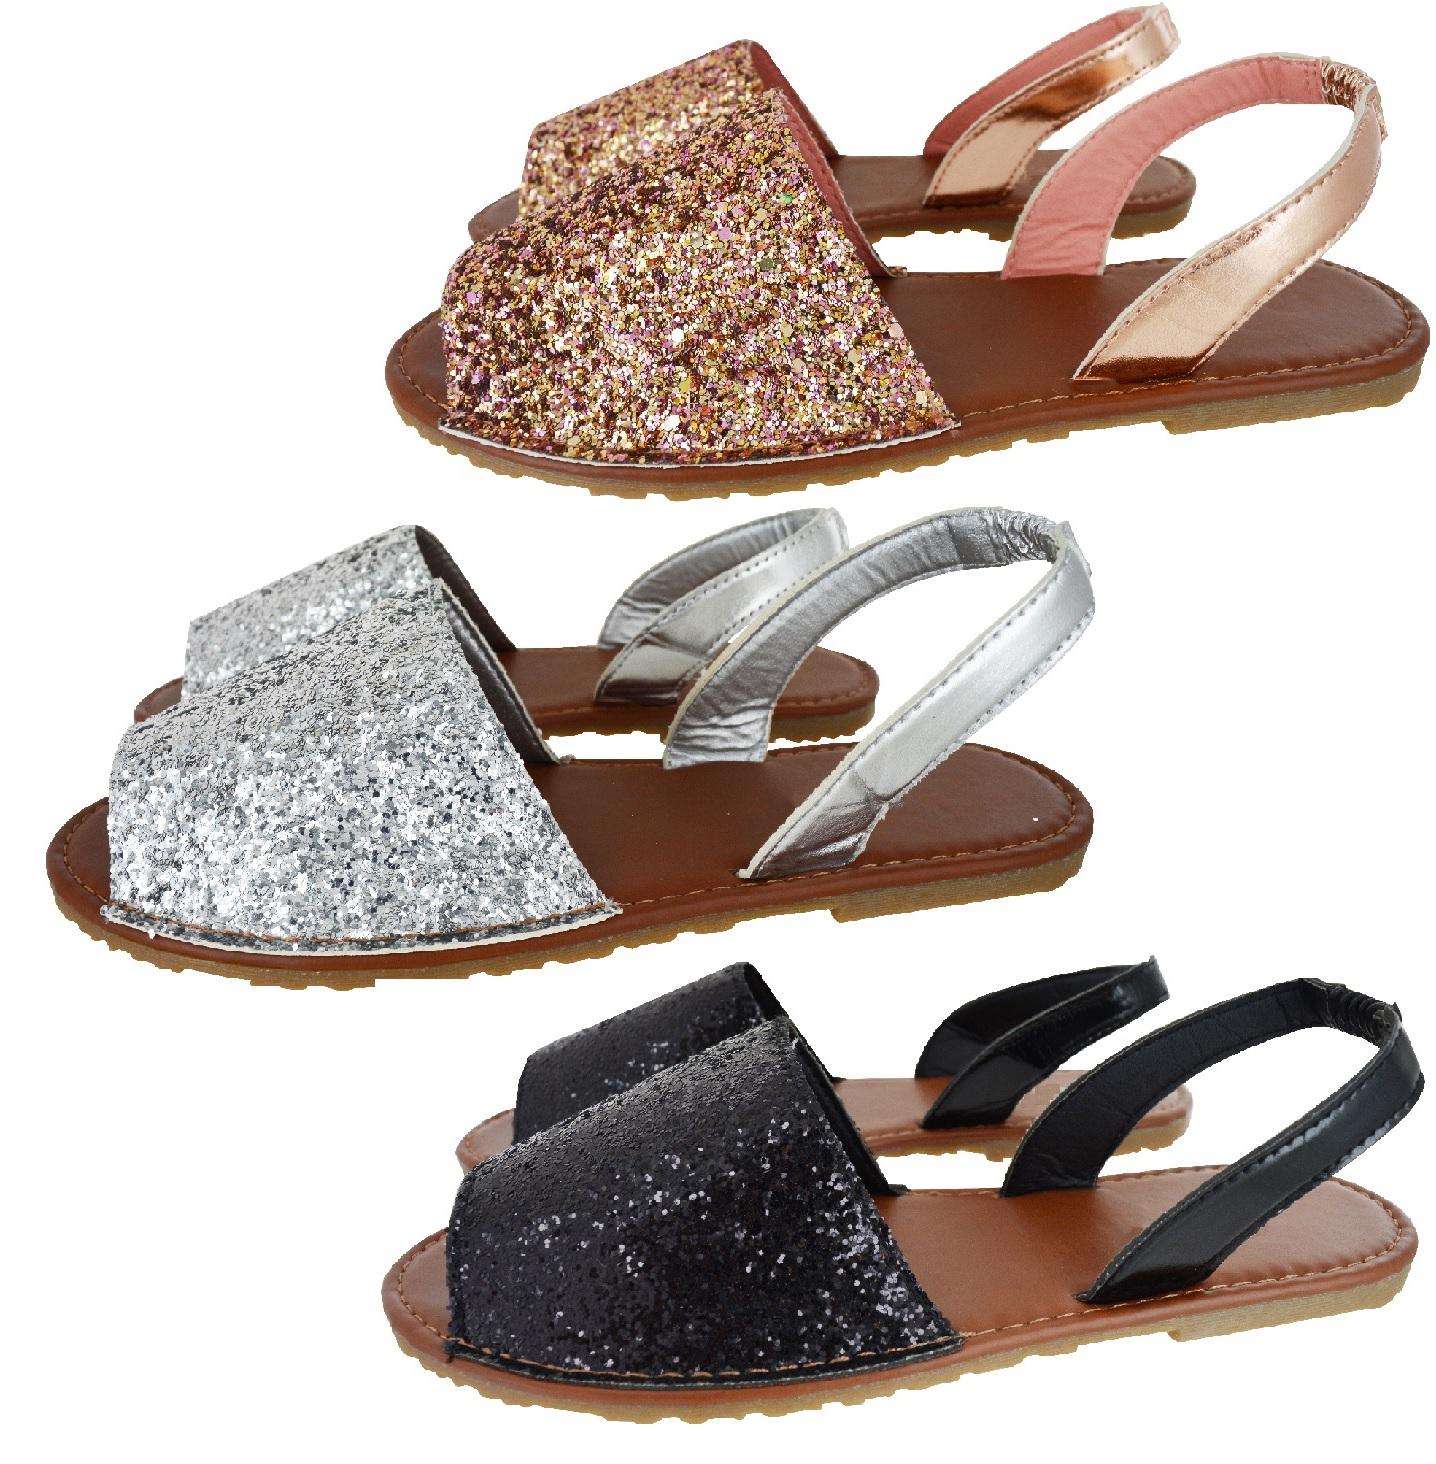 Clearance Swiusd Womens Retro Sequin Glitter Flat Sandals Comfy Slippers Flip Flops Weaved Bottom Straps Beach Dress Shoes